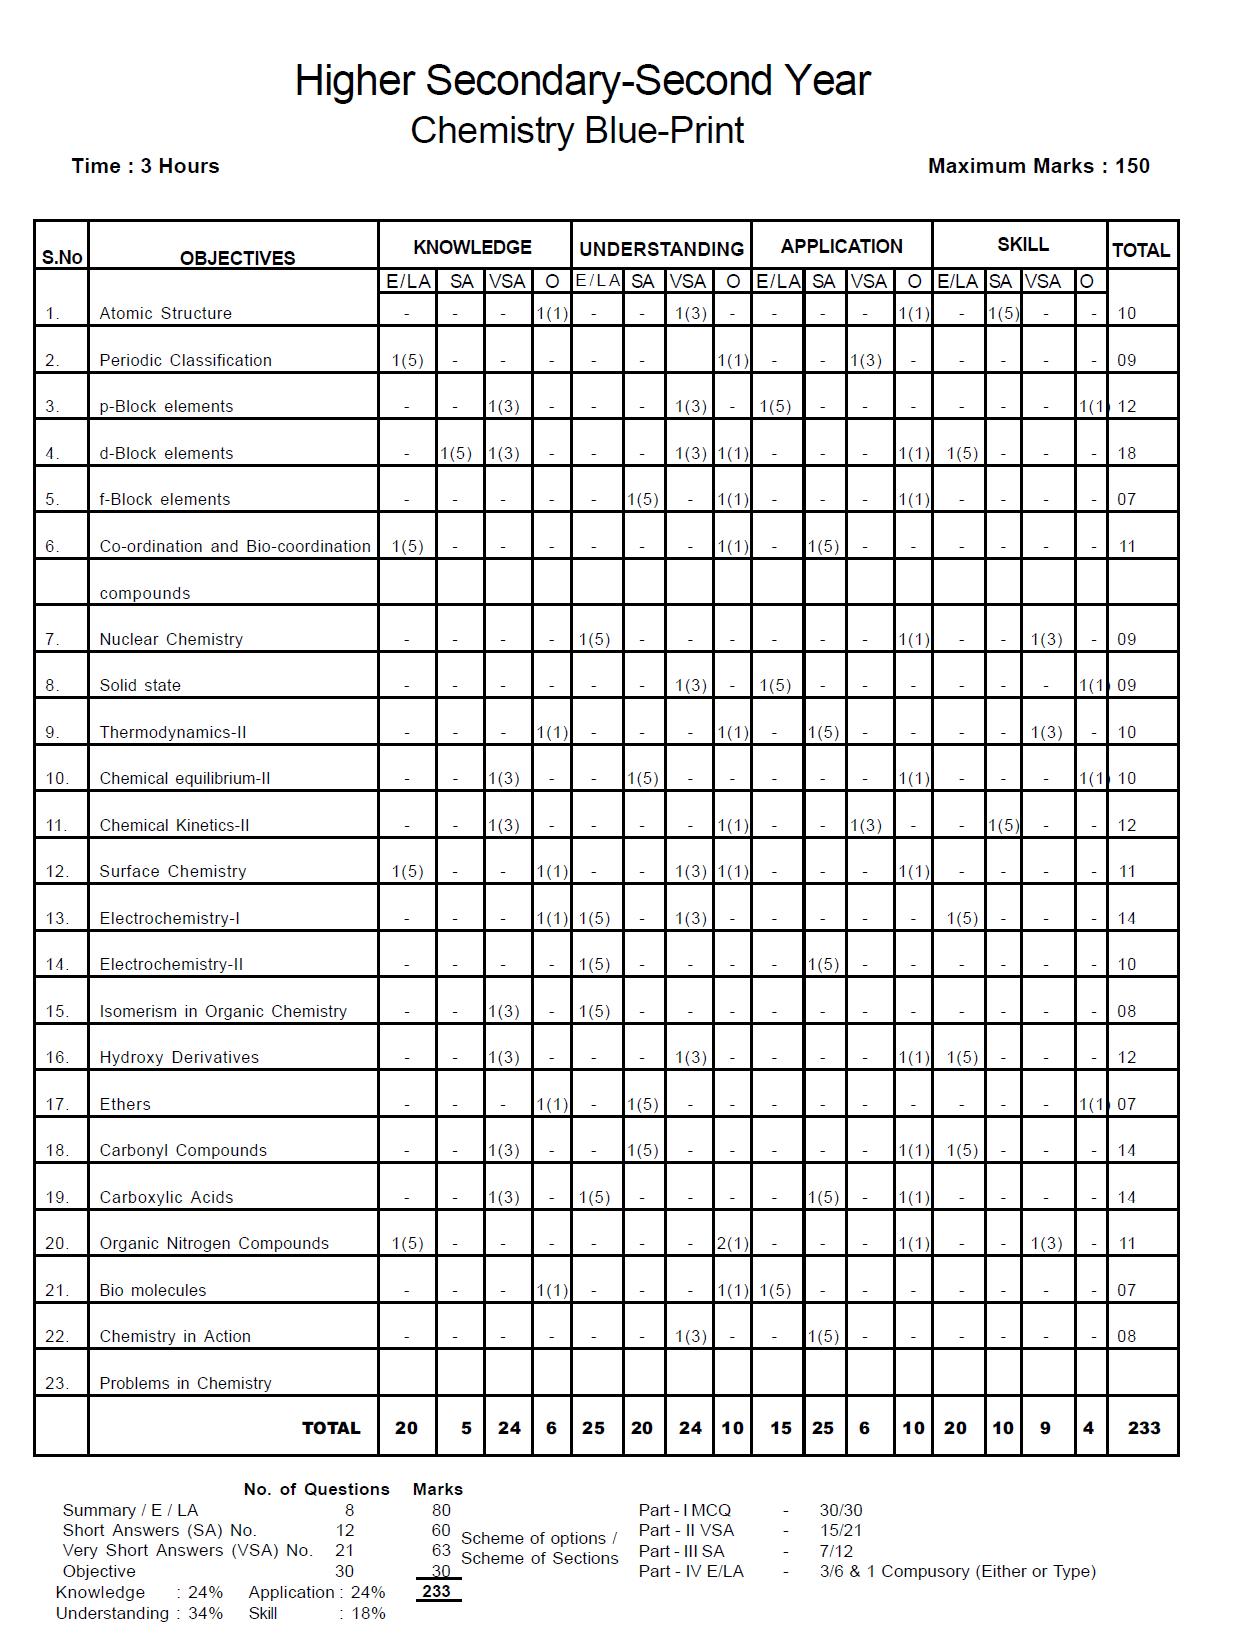 Tamil Nadu Board Class 12 Chemistry Question Paper Blue